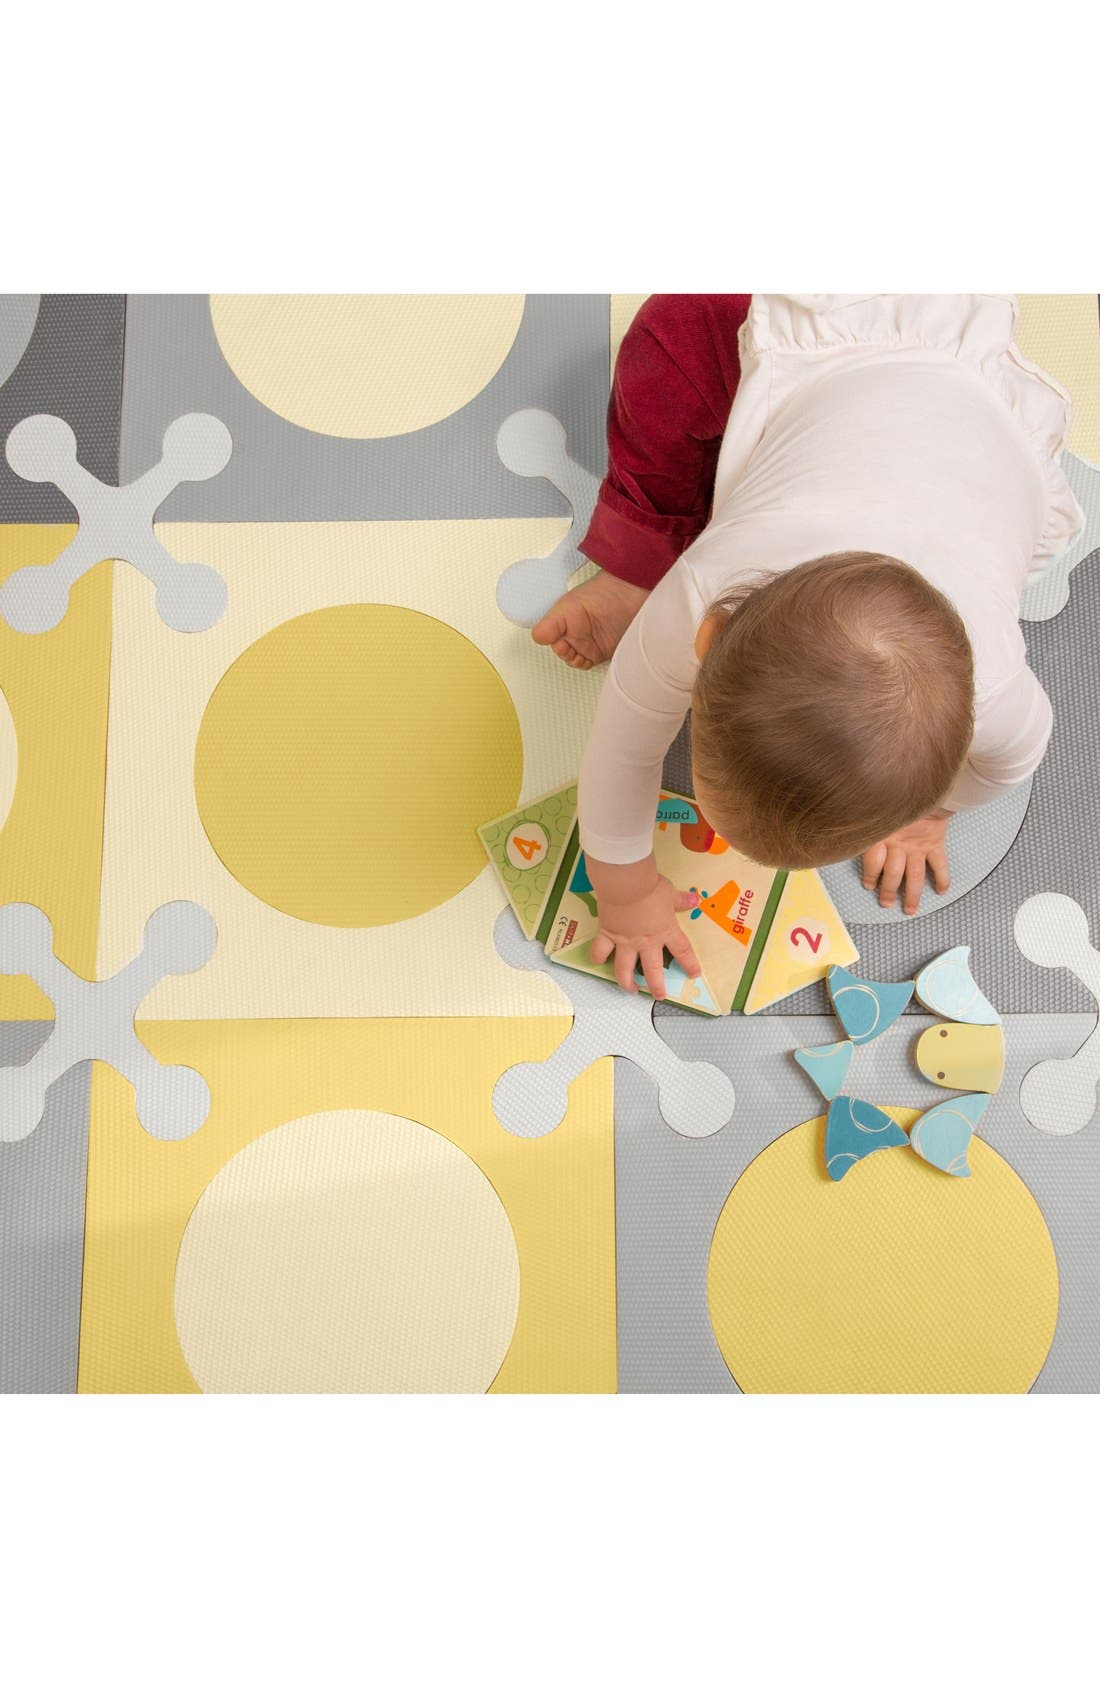 'Playspot' Floor Tiles,                             Alternate thumbnail 5, color,                             Gray/ Gold